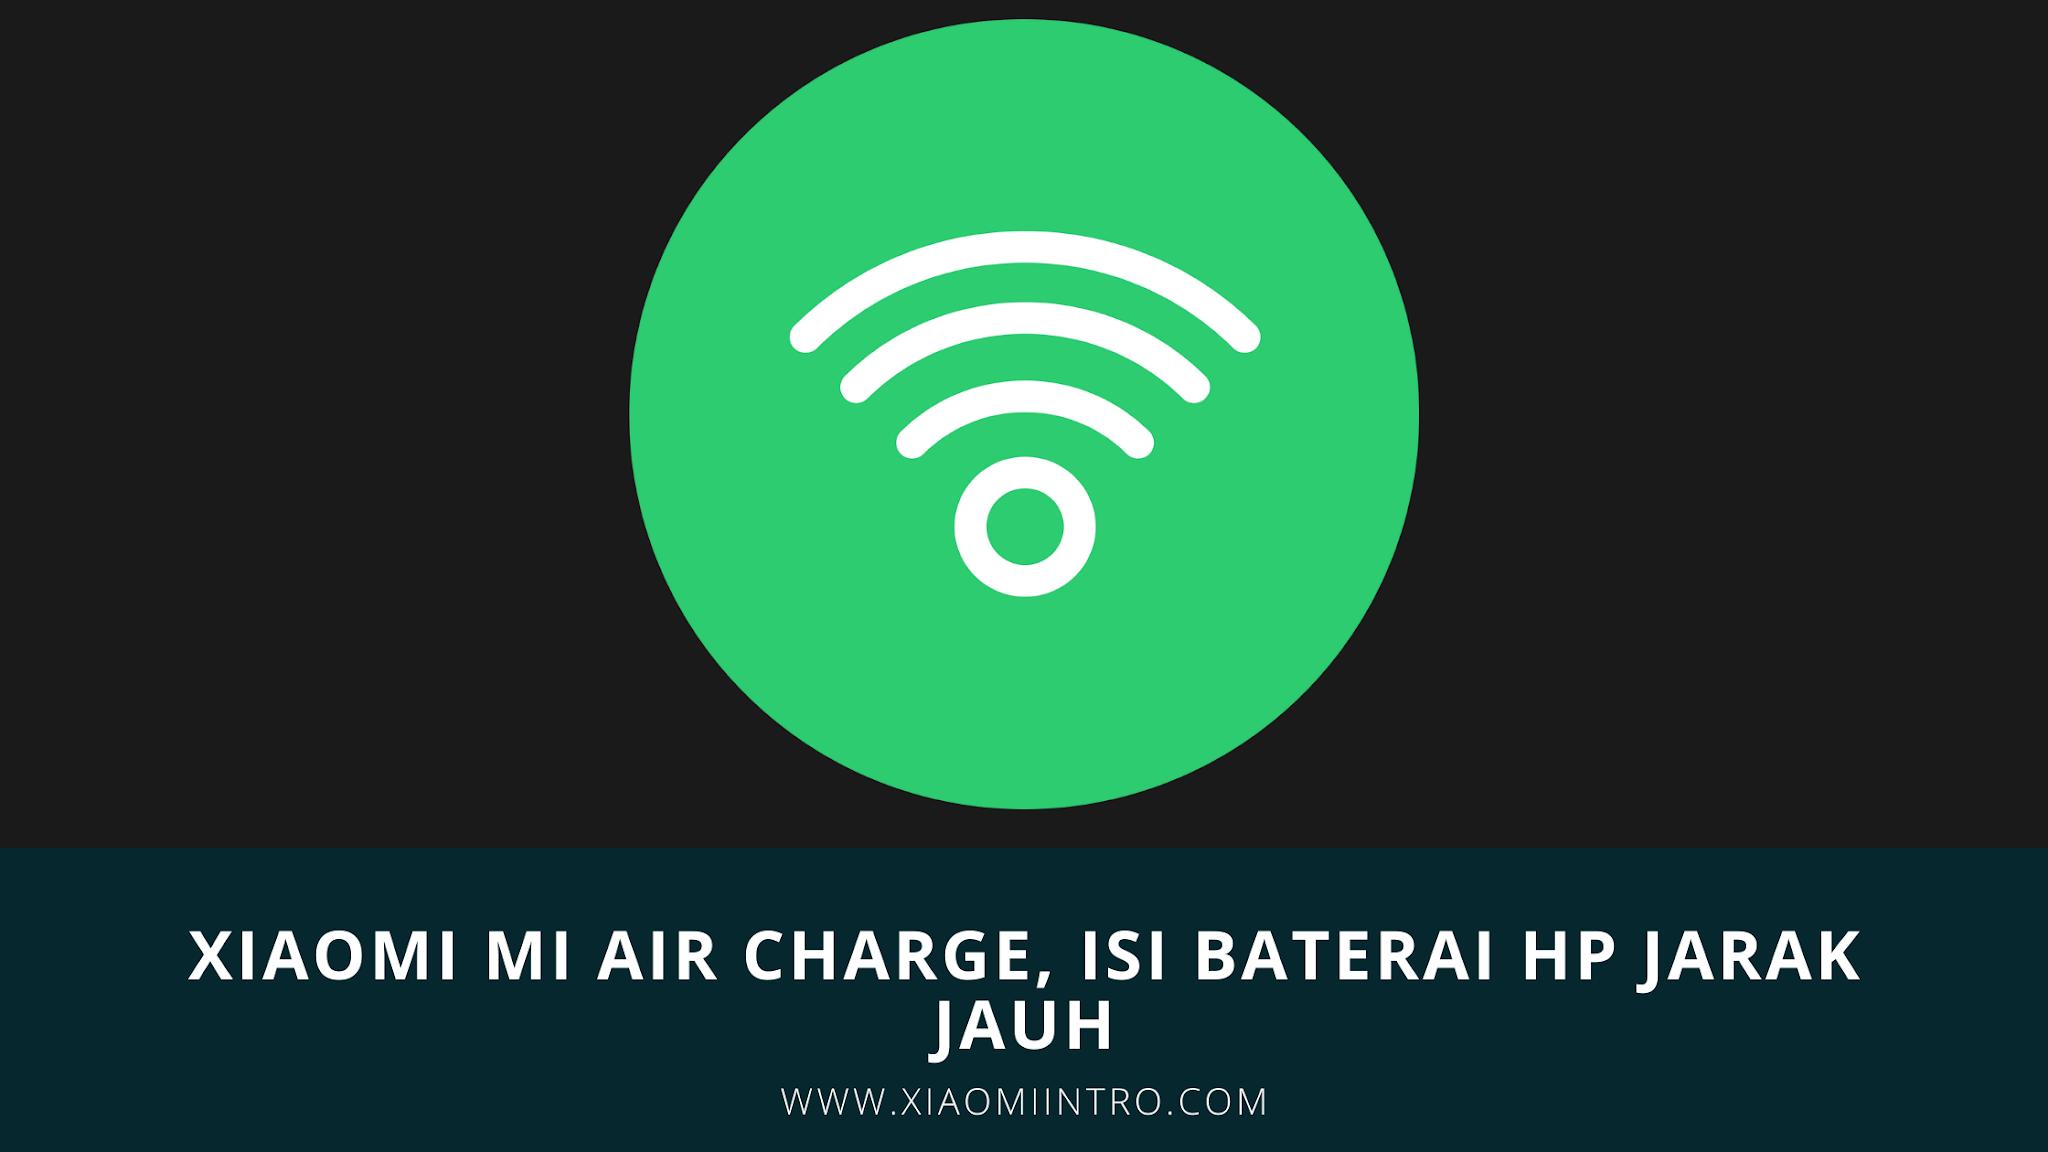 Xiaomi Mi Air Charge, Isi Baterai HP Jarak Jauh